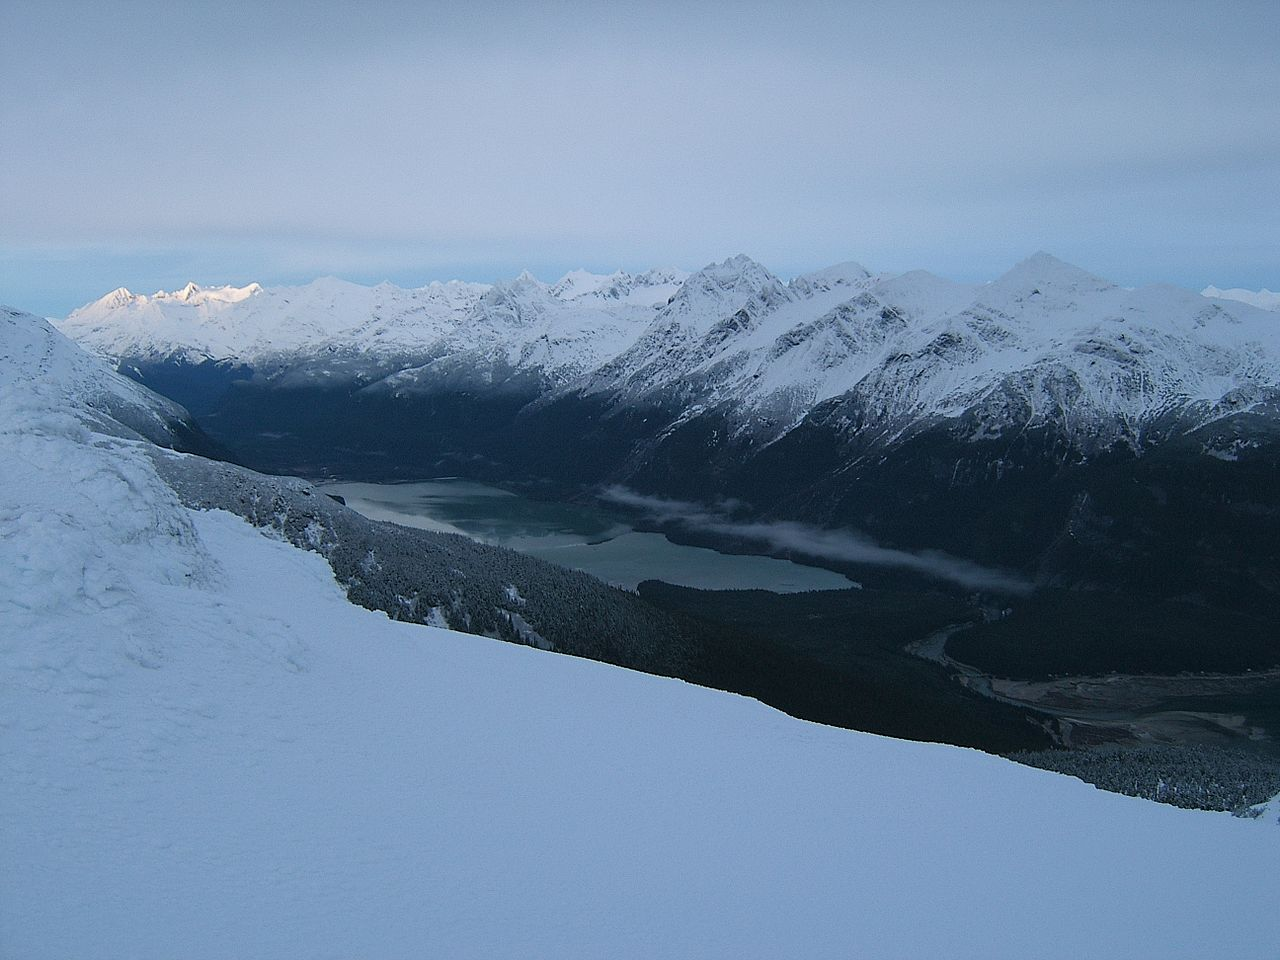 Popular Lake Of Alaska City-Chilkoot Lake